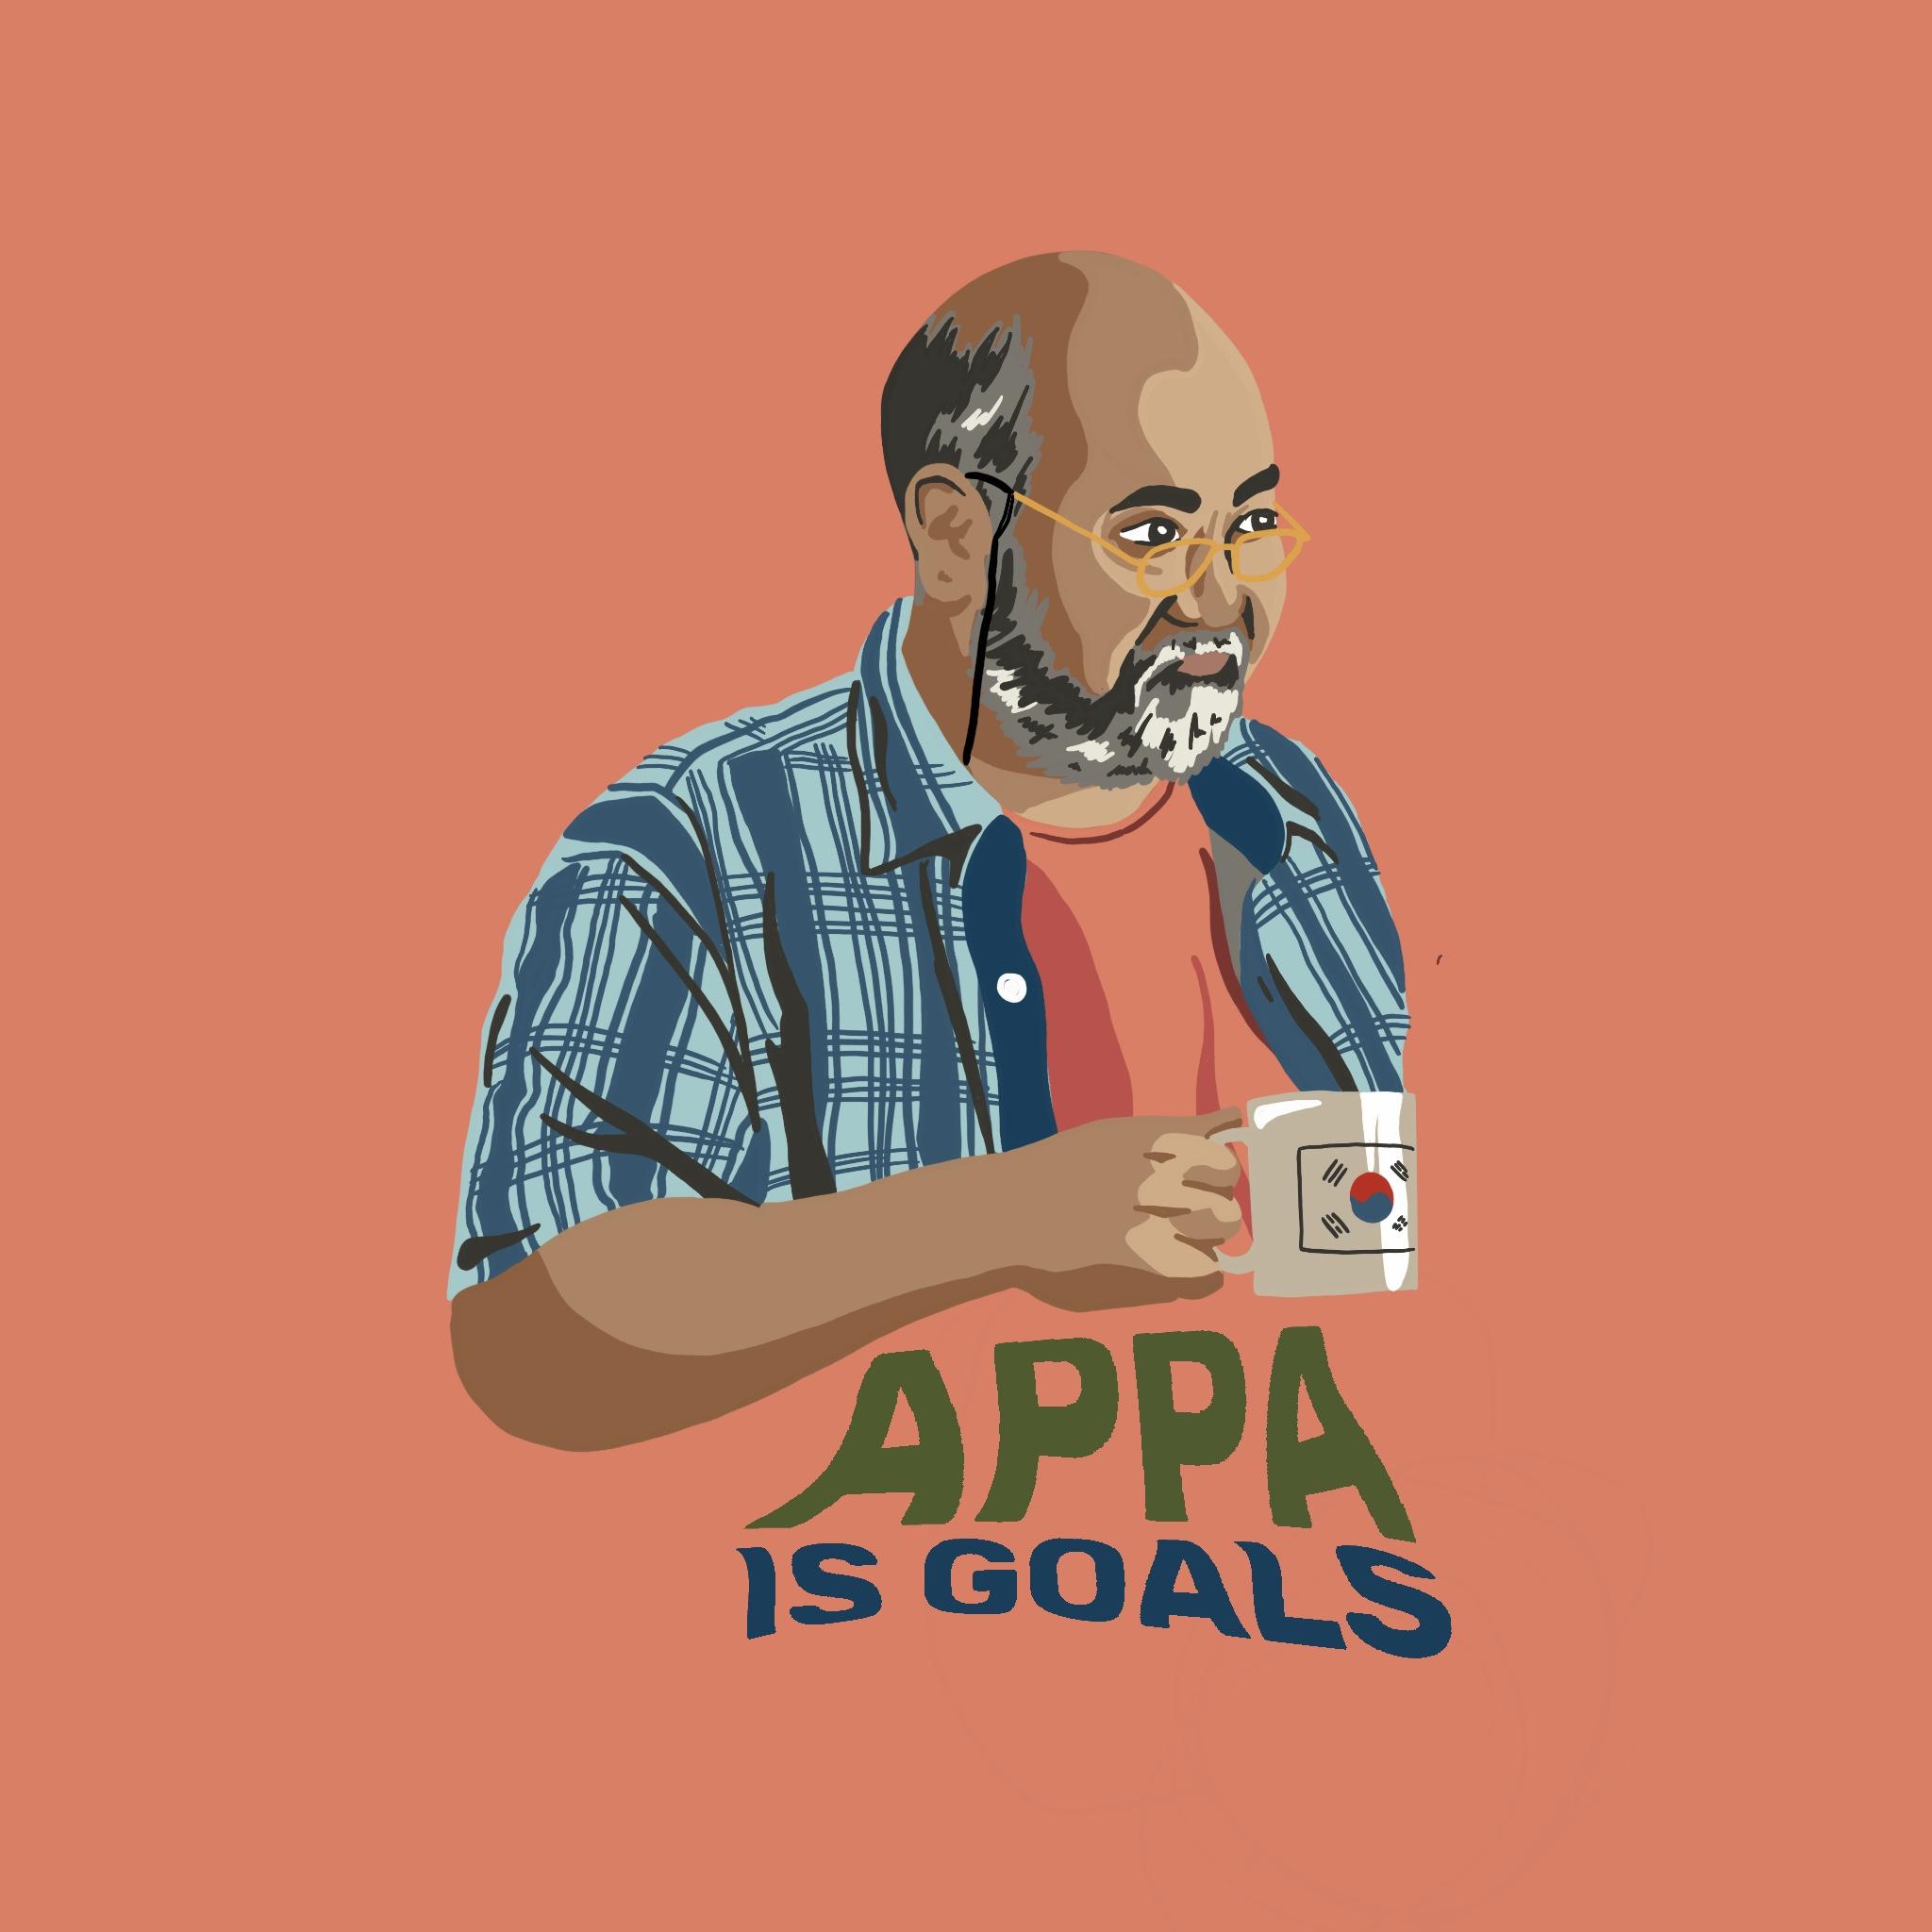 12 Appa is Goals.JPG